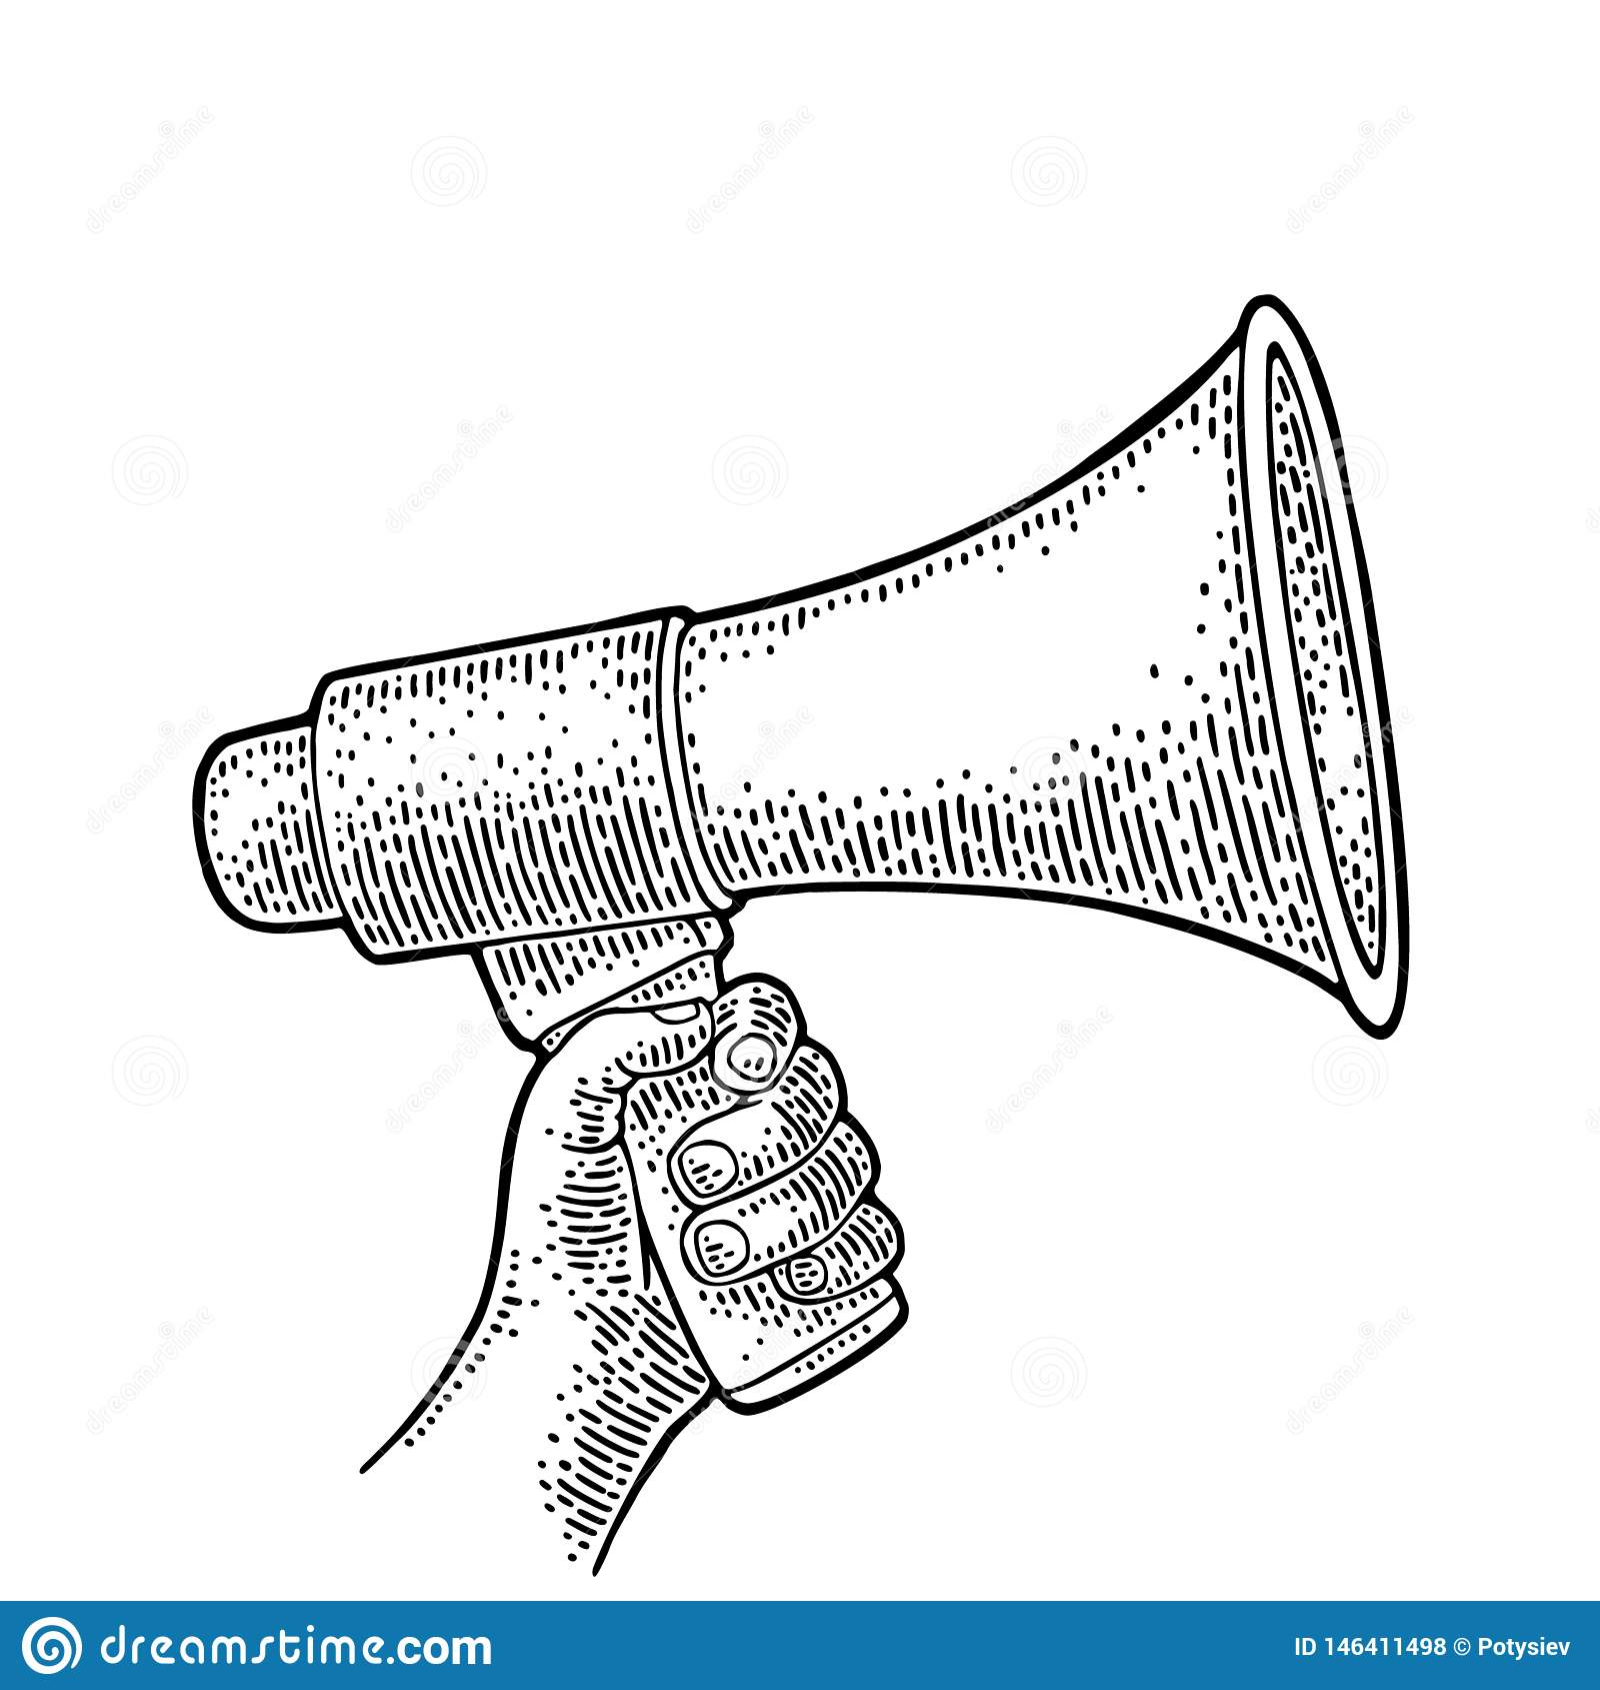 male hand holding loudspeaker stock vector illustration of concept media 146411498 dreamstime com